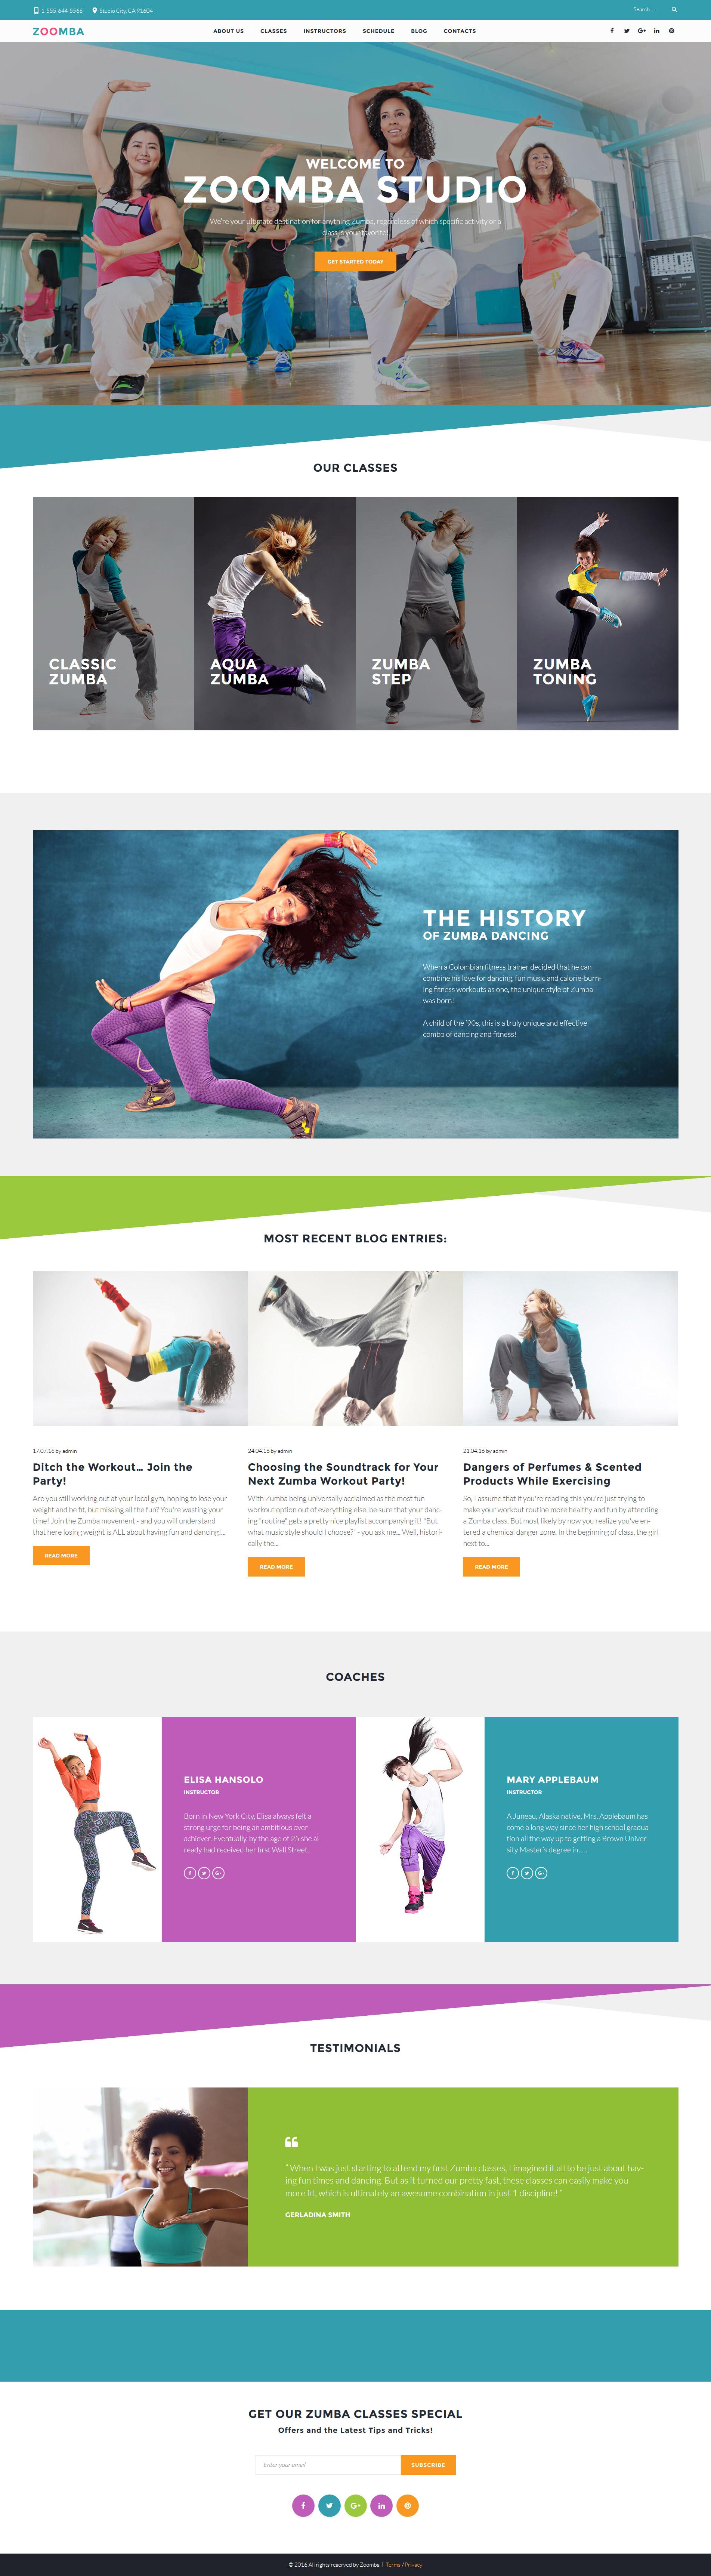 Reszponzív Zoomba - Zoomba Dance Studio WordPress sablon 61364